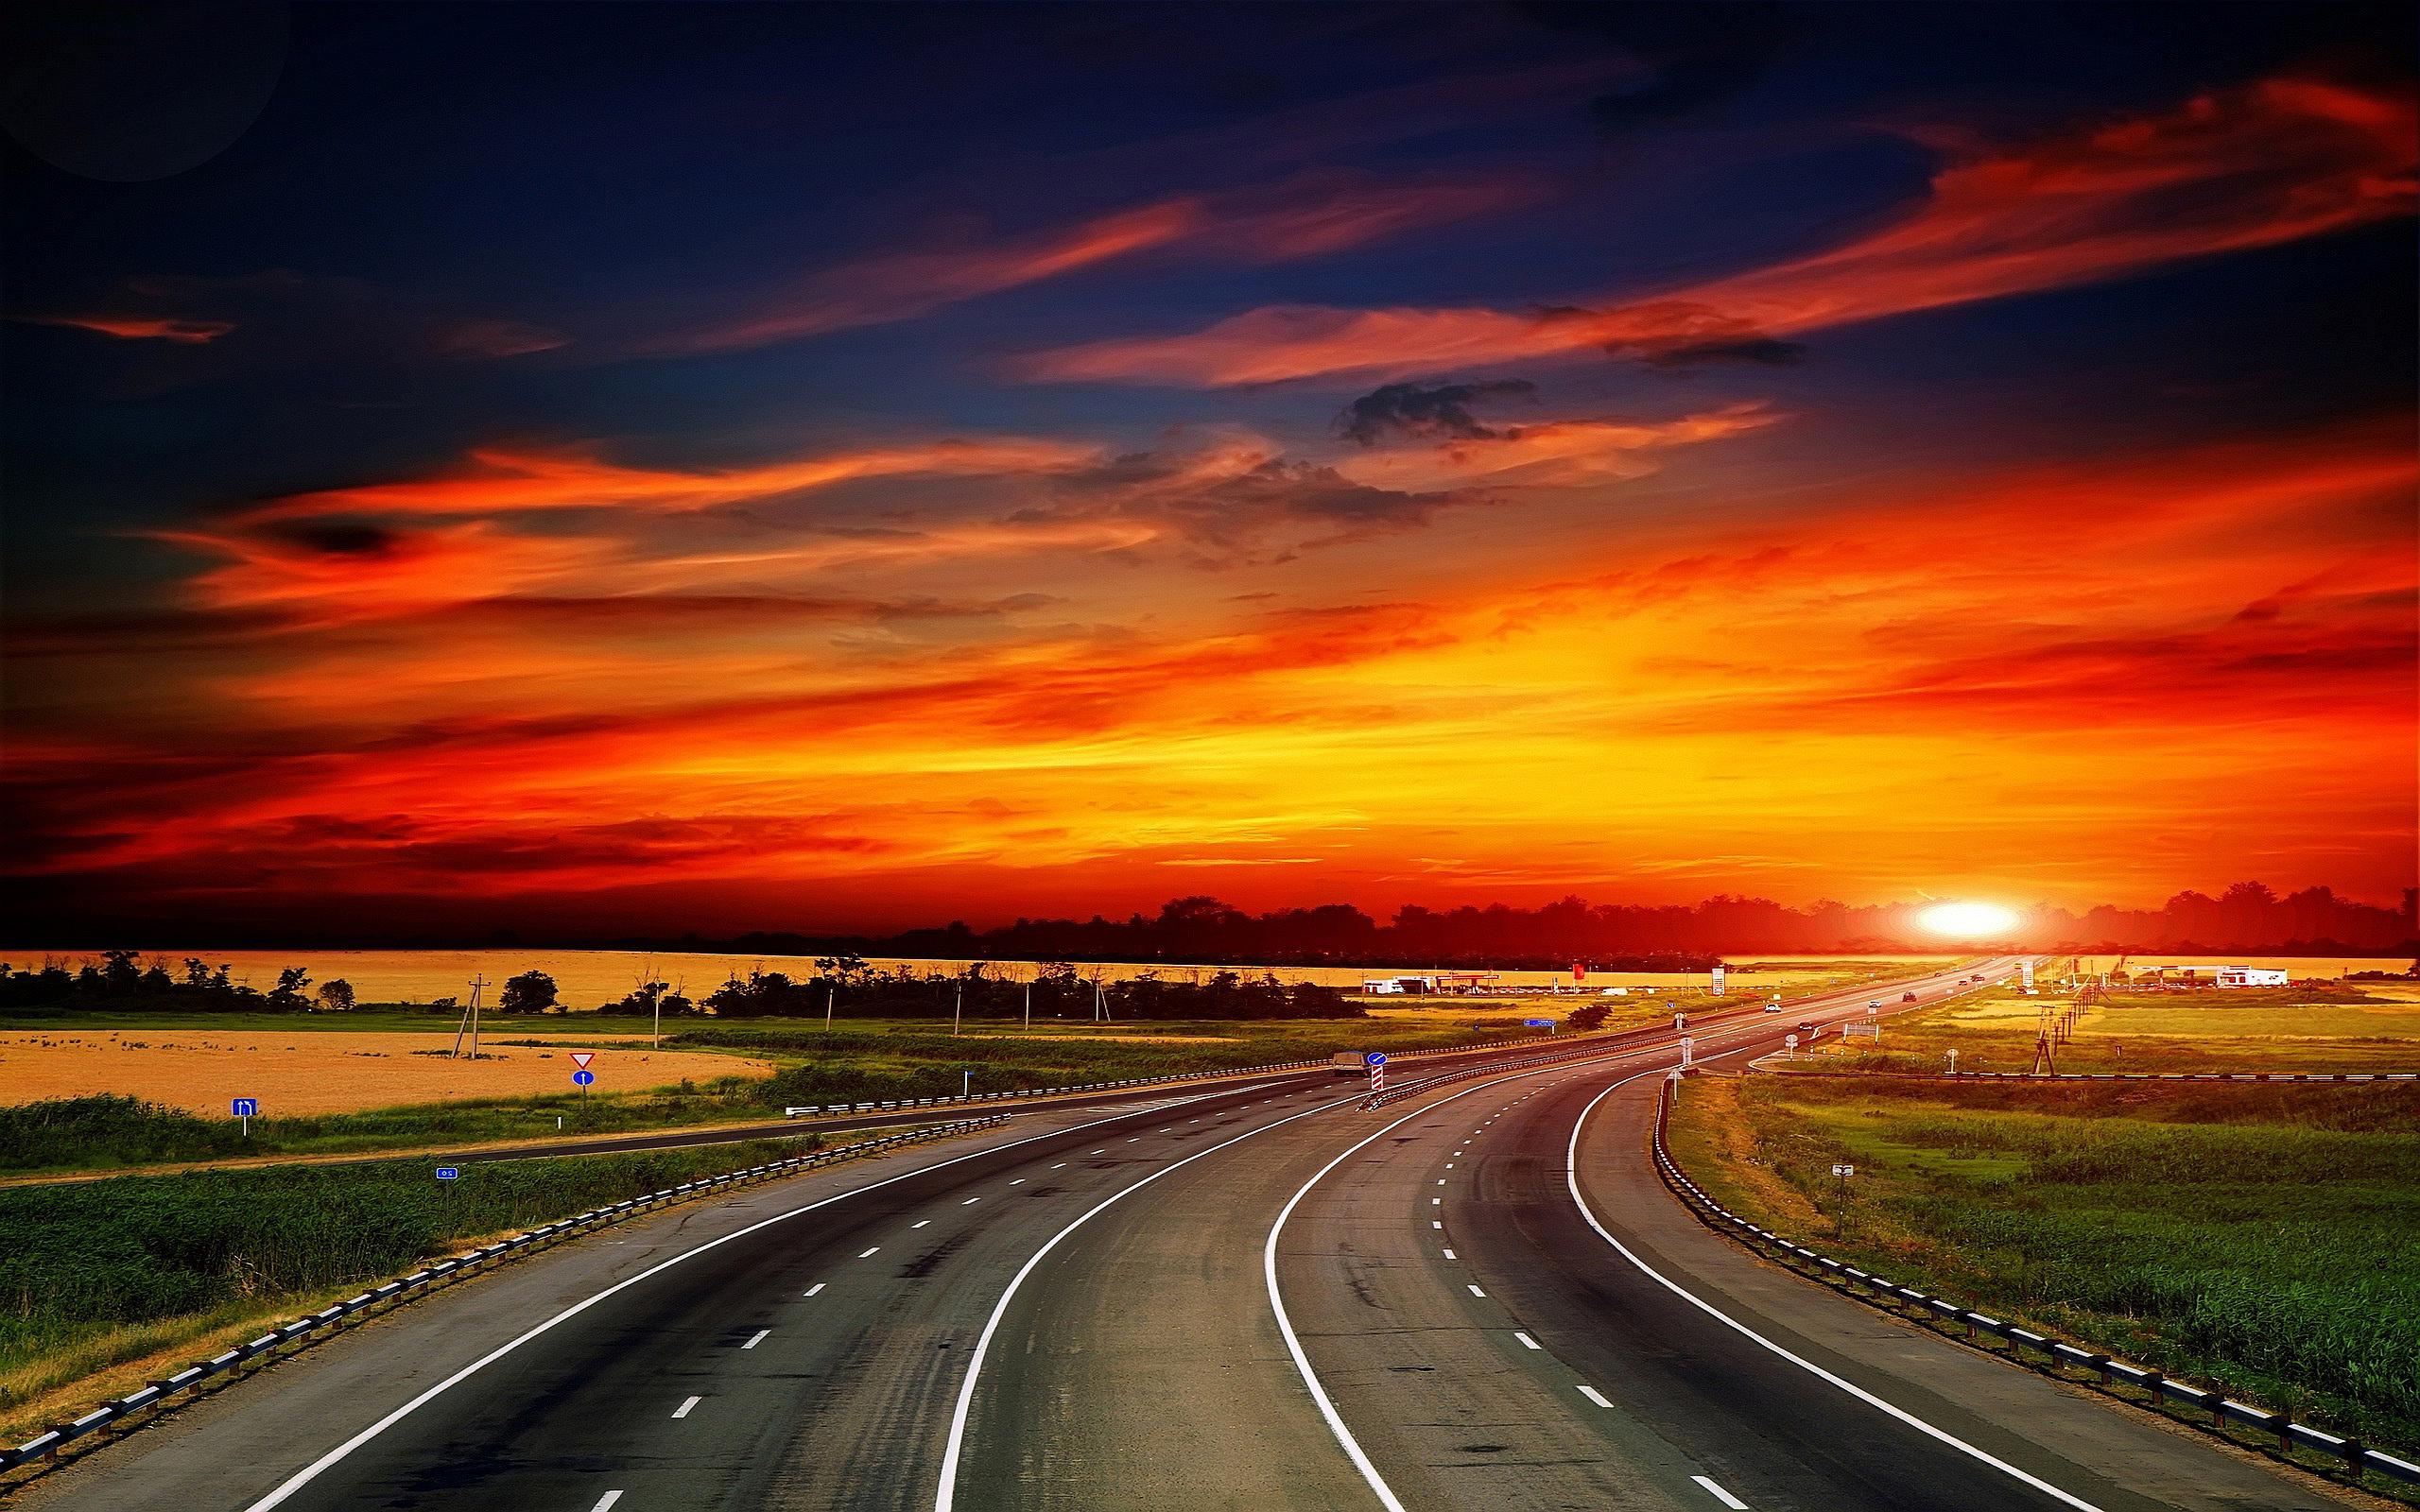 Sunset Highway Wallpaper 2560x1600 32108